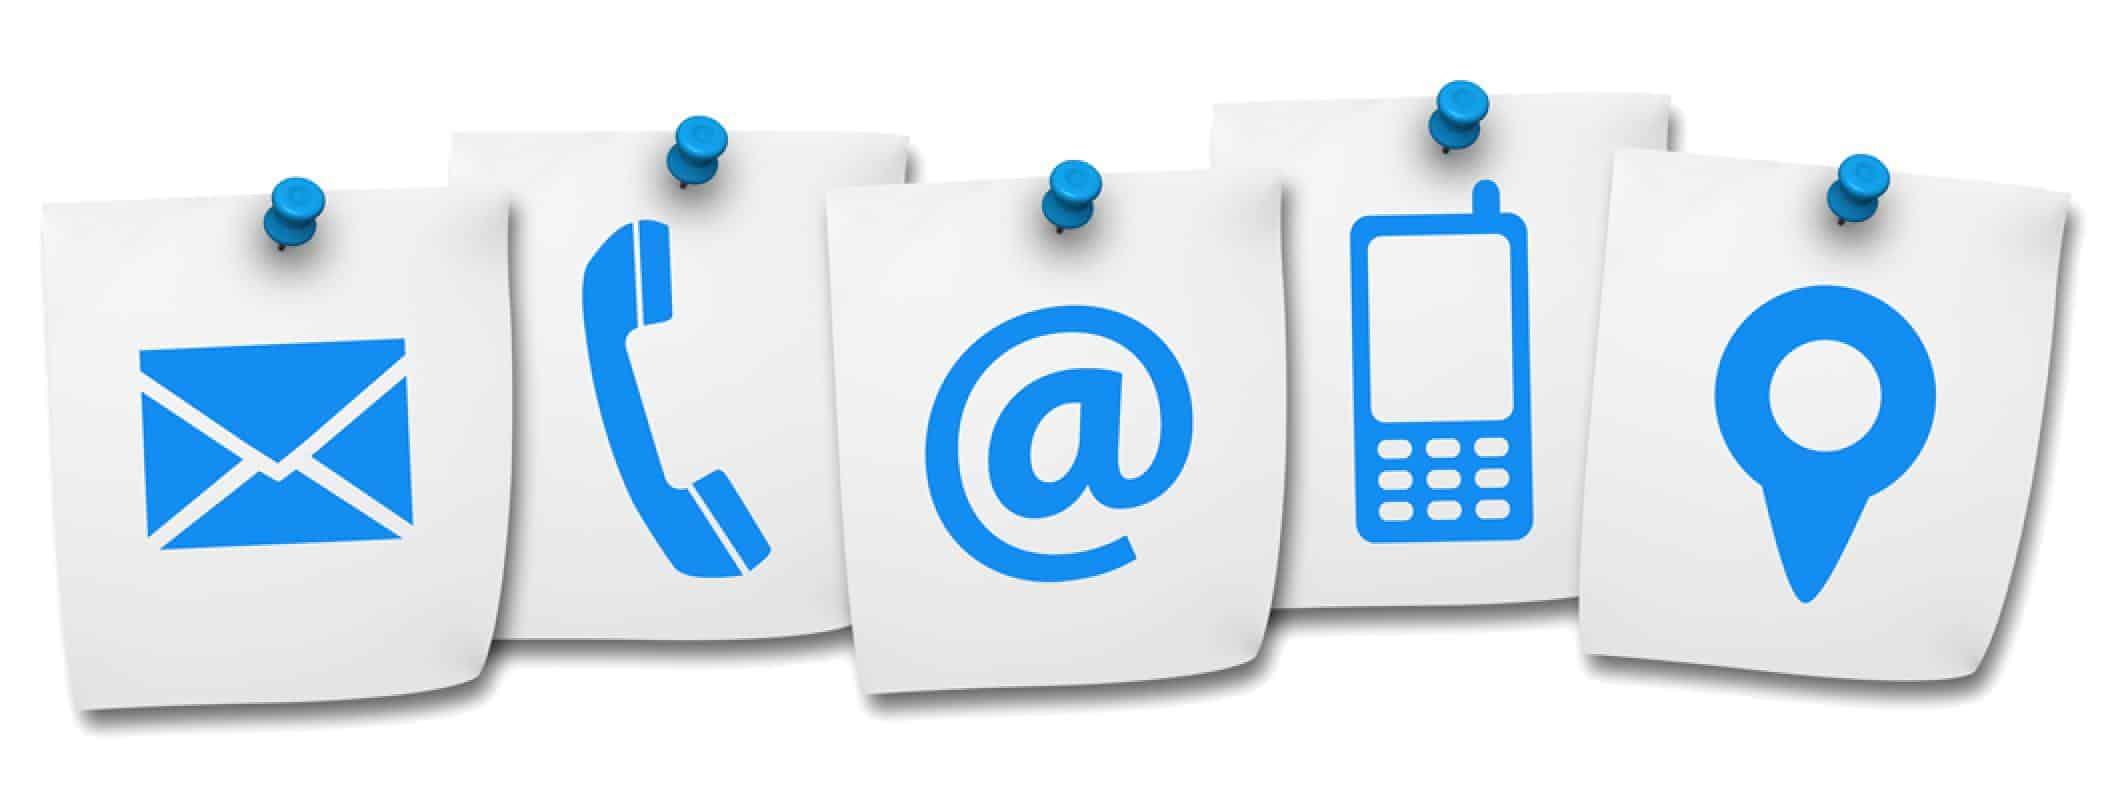 kontakt_shutterstock_148294223_niroworld_1060px_0 Kontaktformular